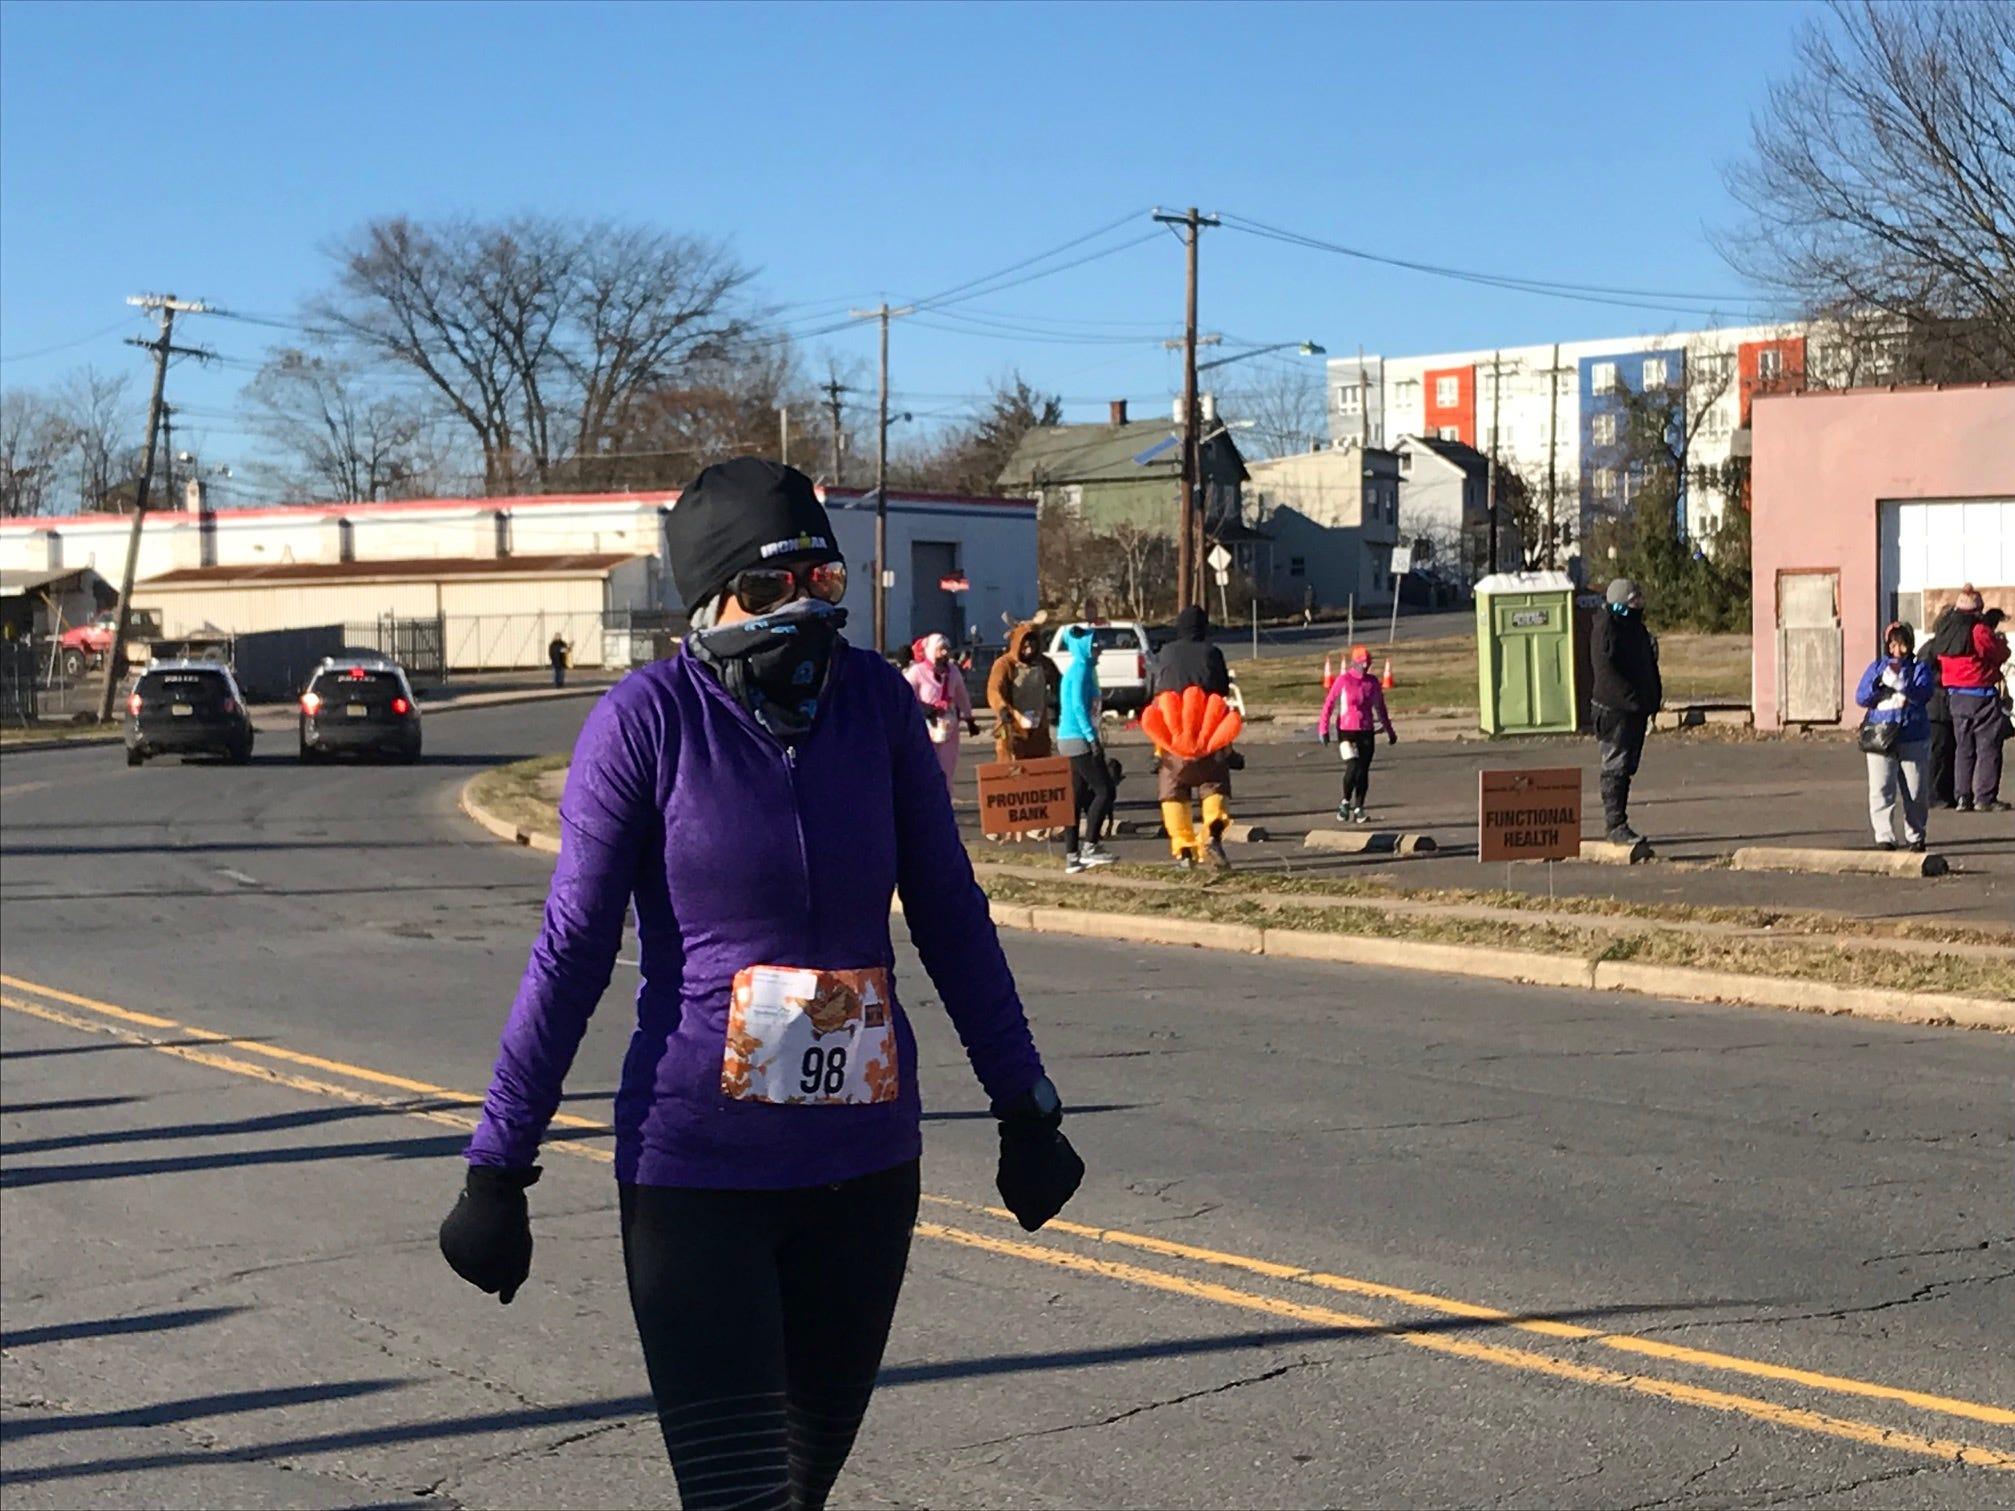 A bundled up runner prepares to run in the Somerville 5K Turkey Trot on Thanksgiving.